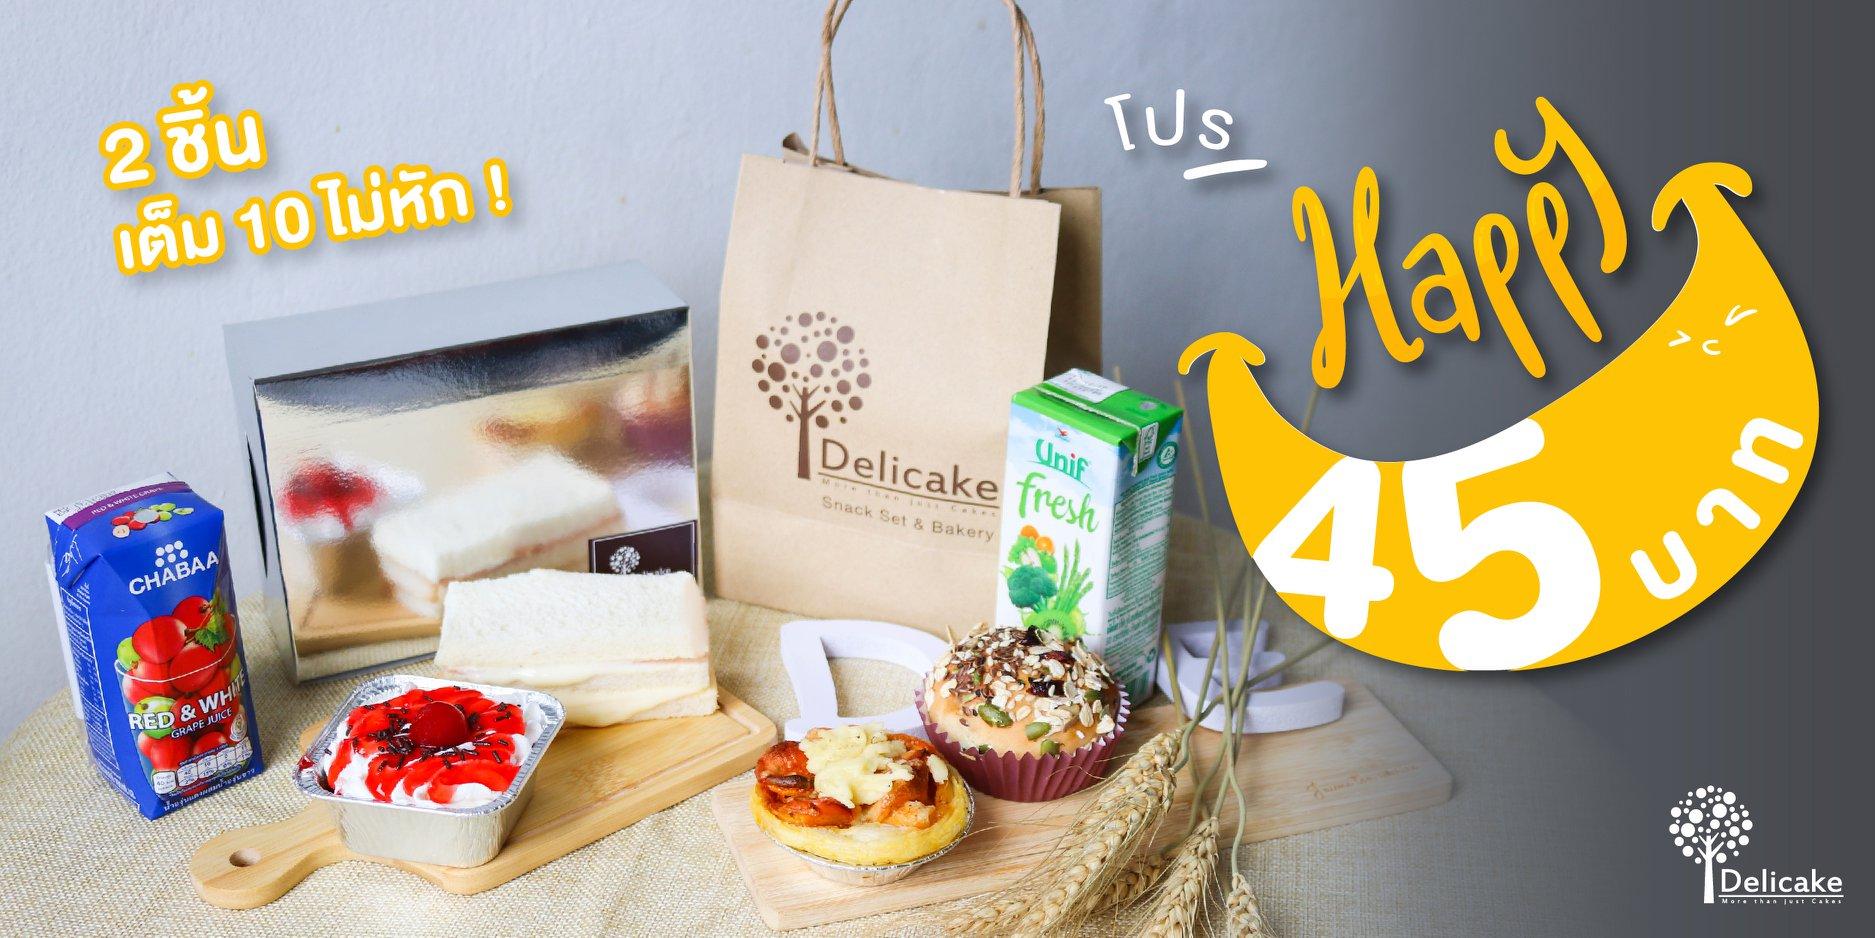 Snack Box โปรโมชั่น 𝙃𝙖𝙥𝙥𝙮 45 บาทจาก Delicake